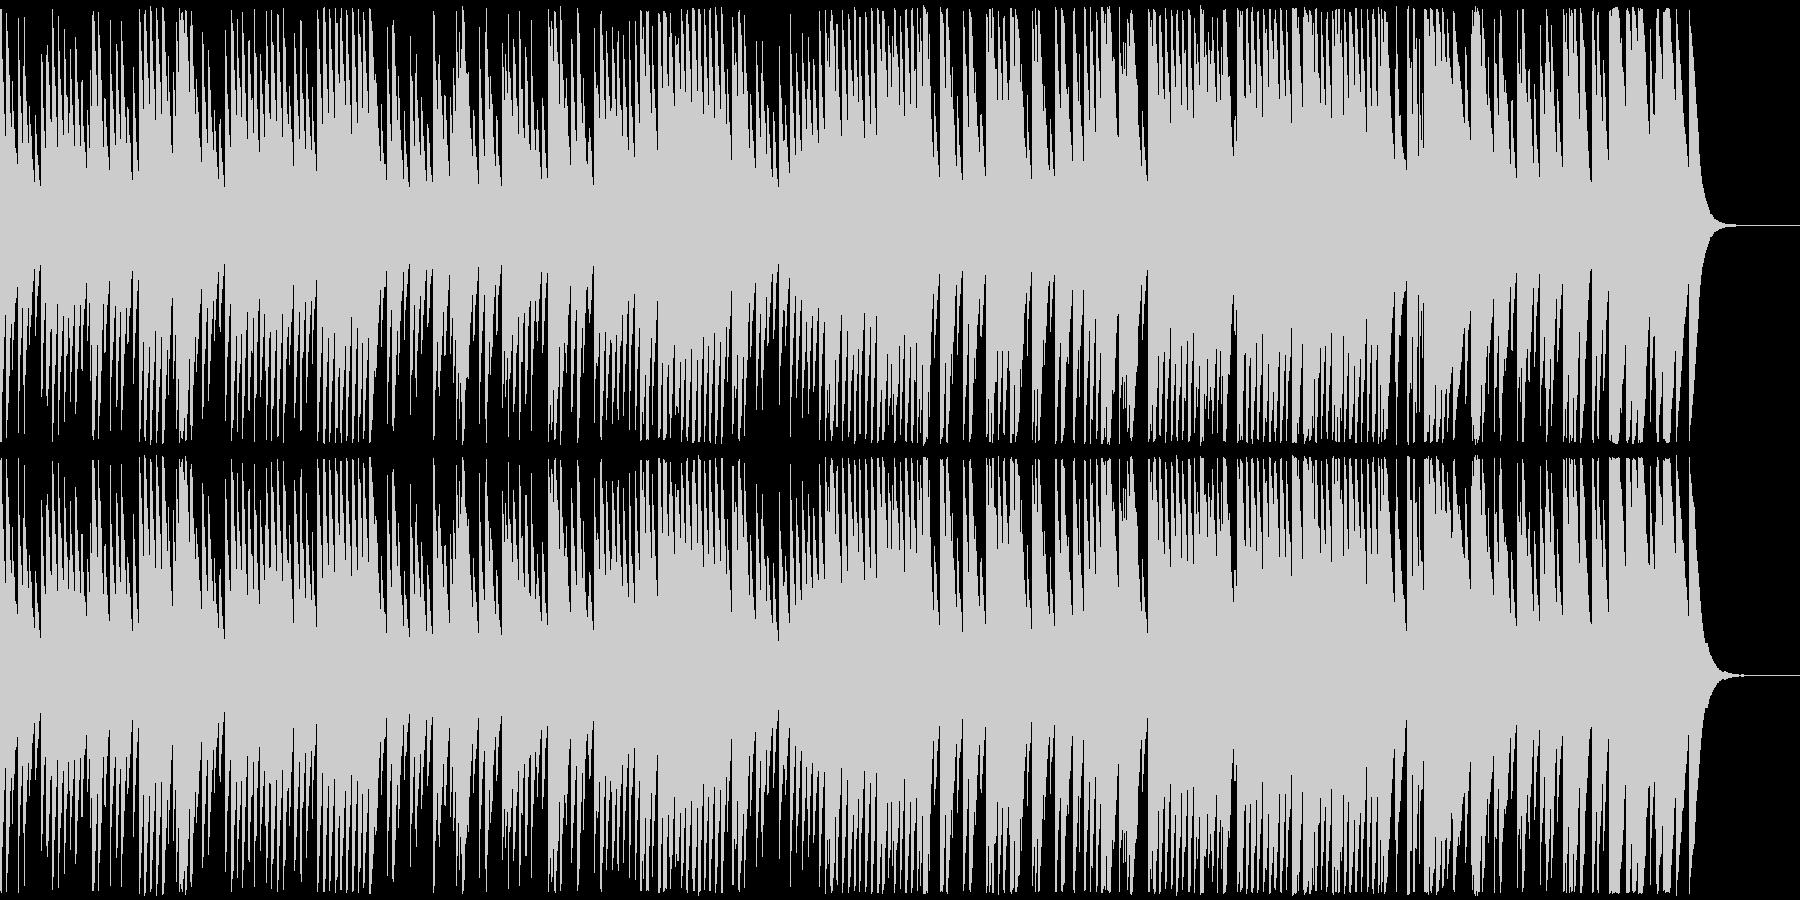 8bit音源の切ないバラード曲(桜逢瀬)の未再生の波形